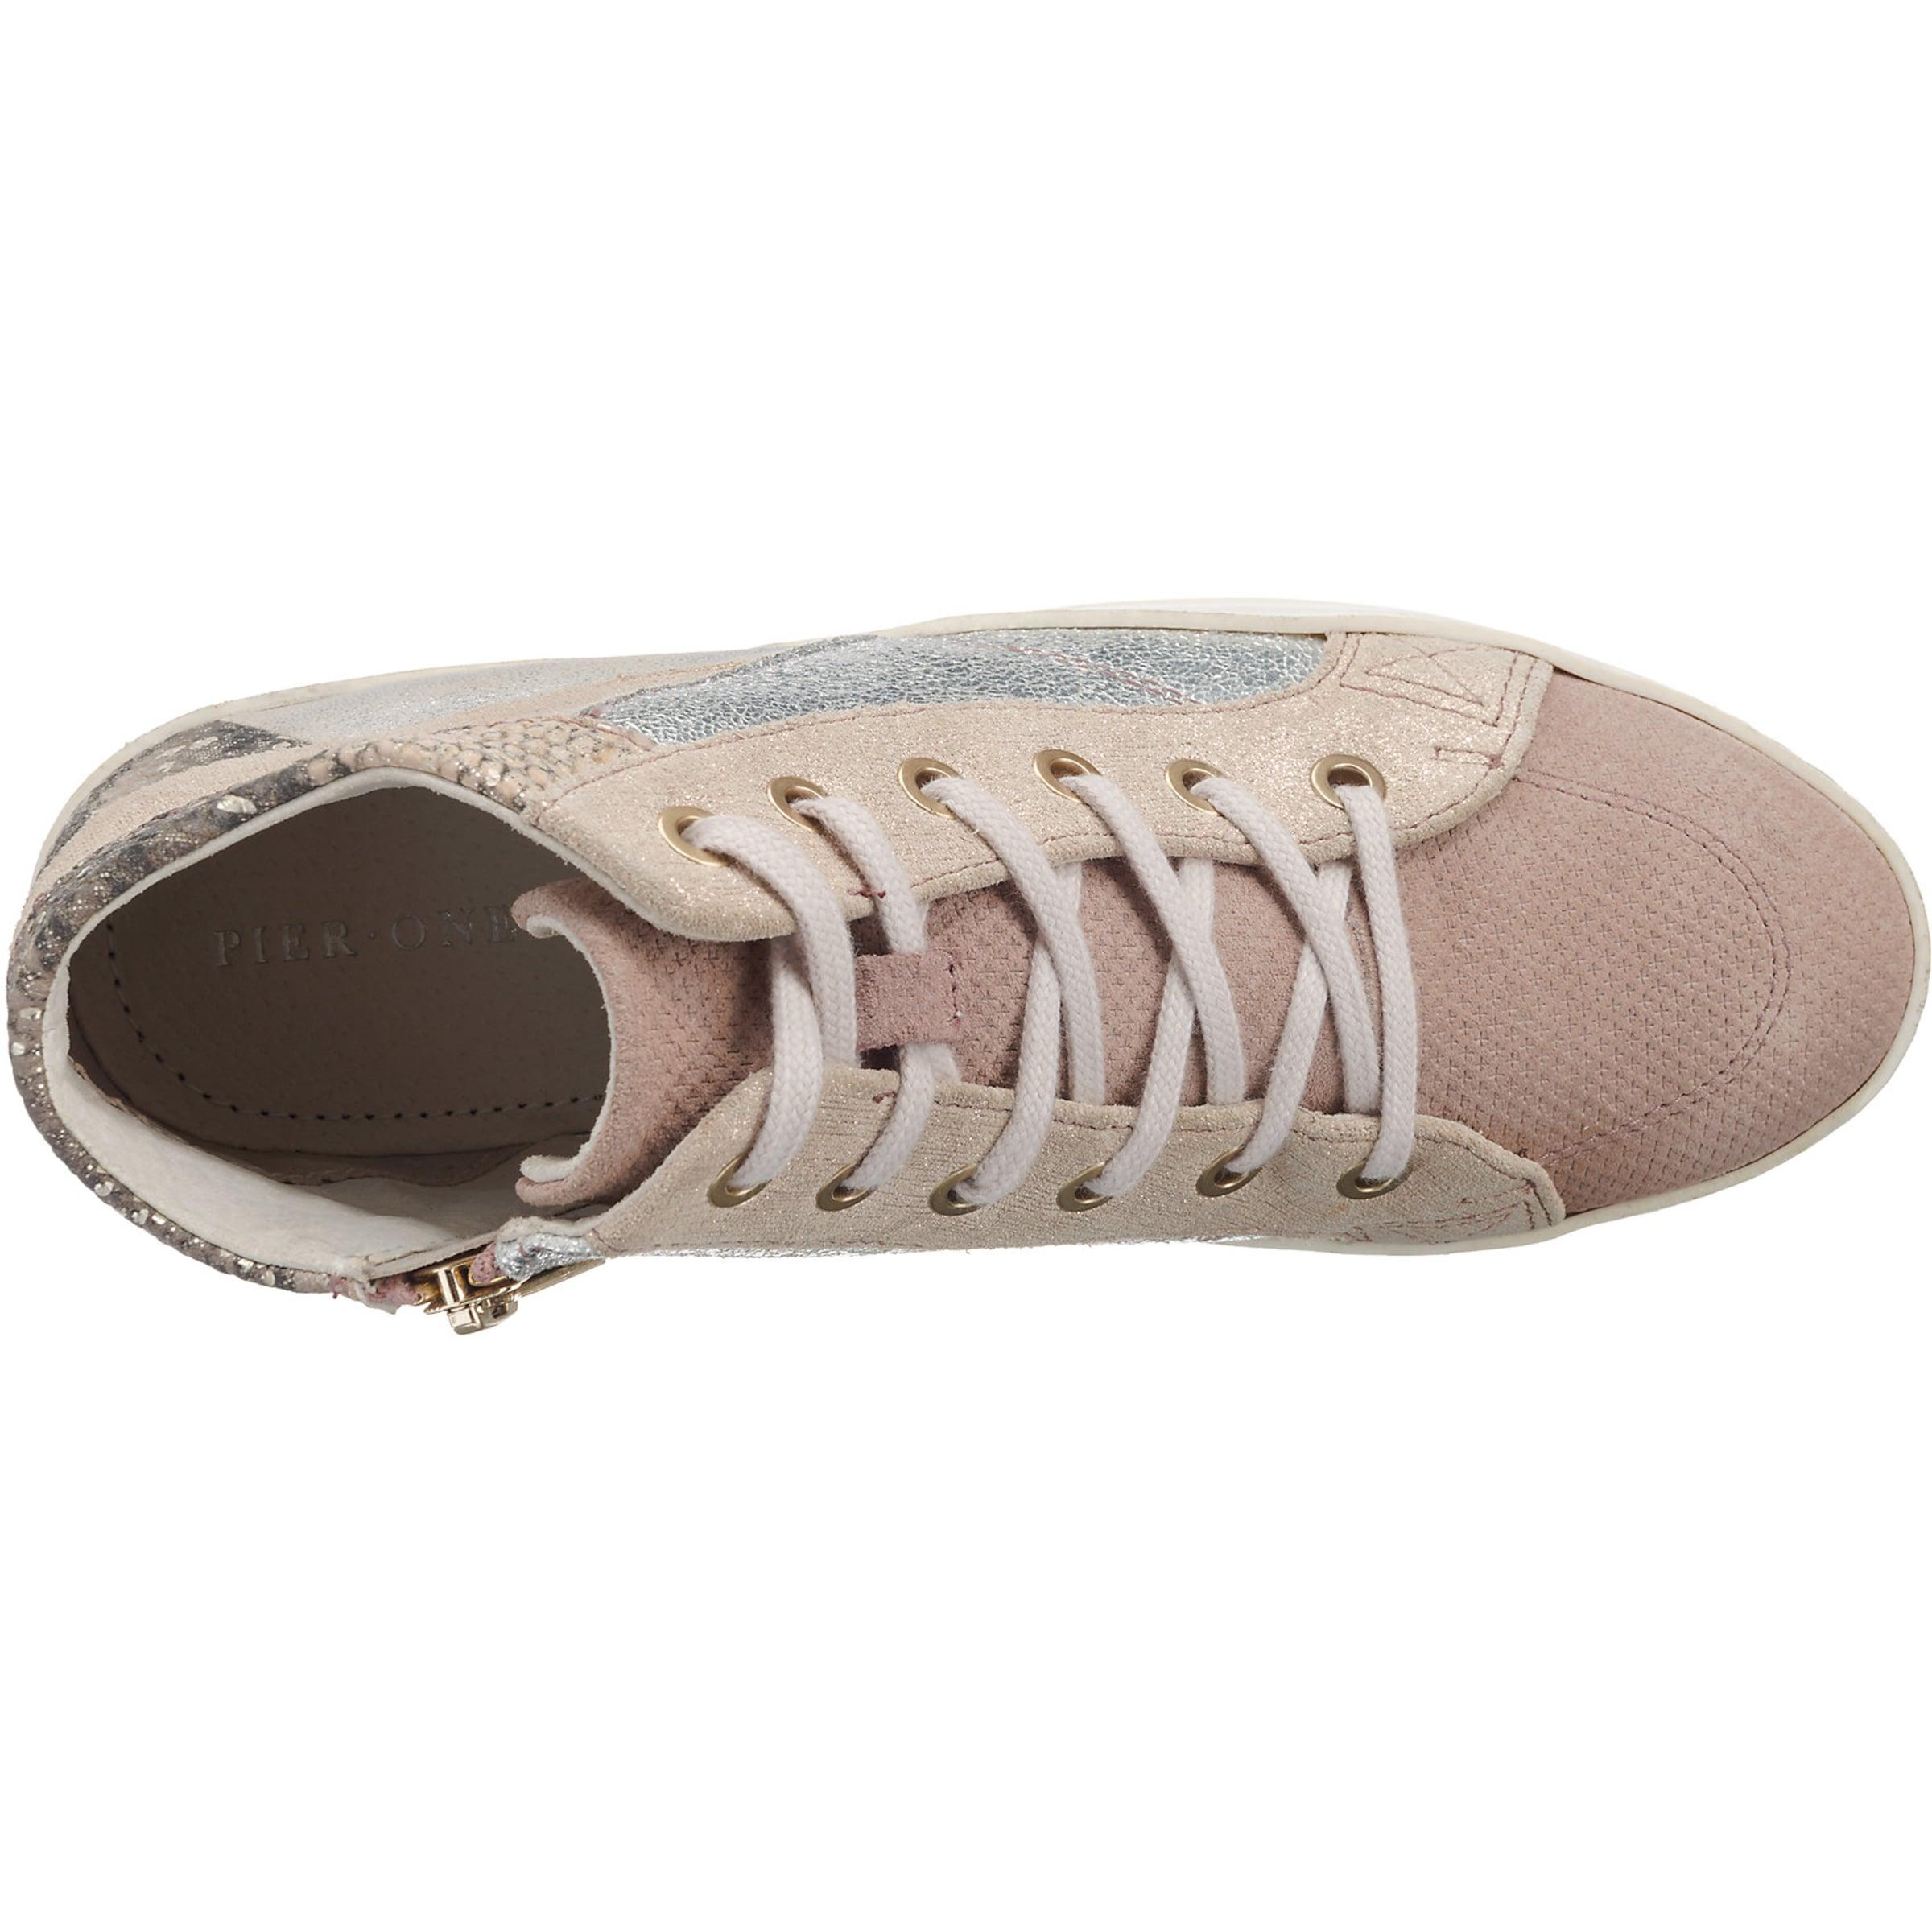 GoldPuder In Sneakers Silber Pier One Altrosa 53jRq4AL